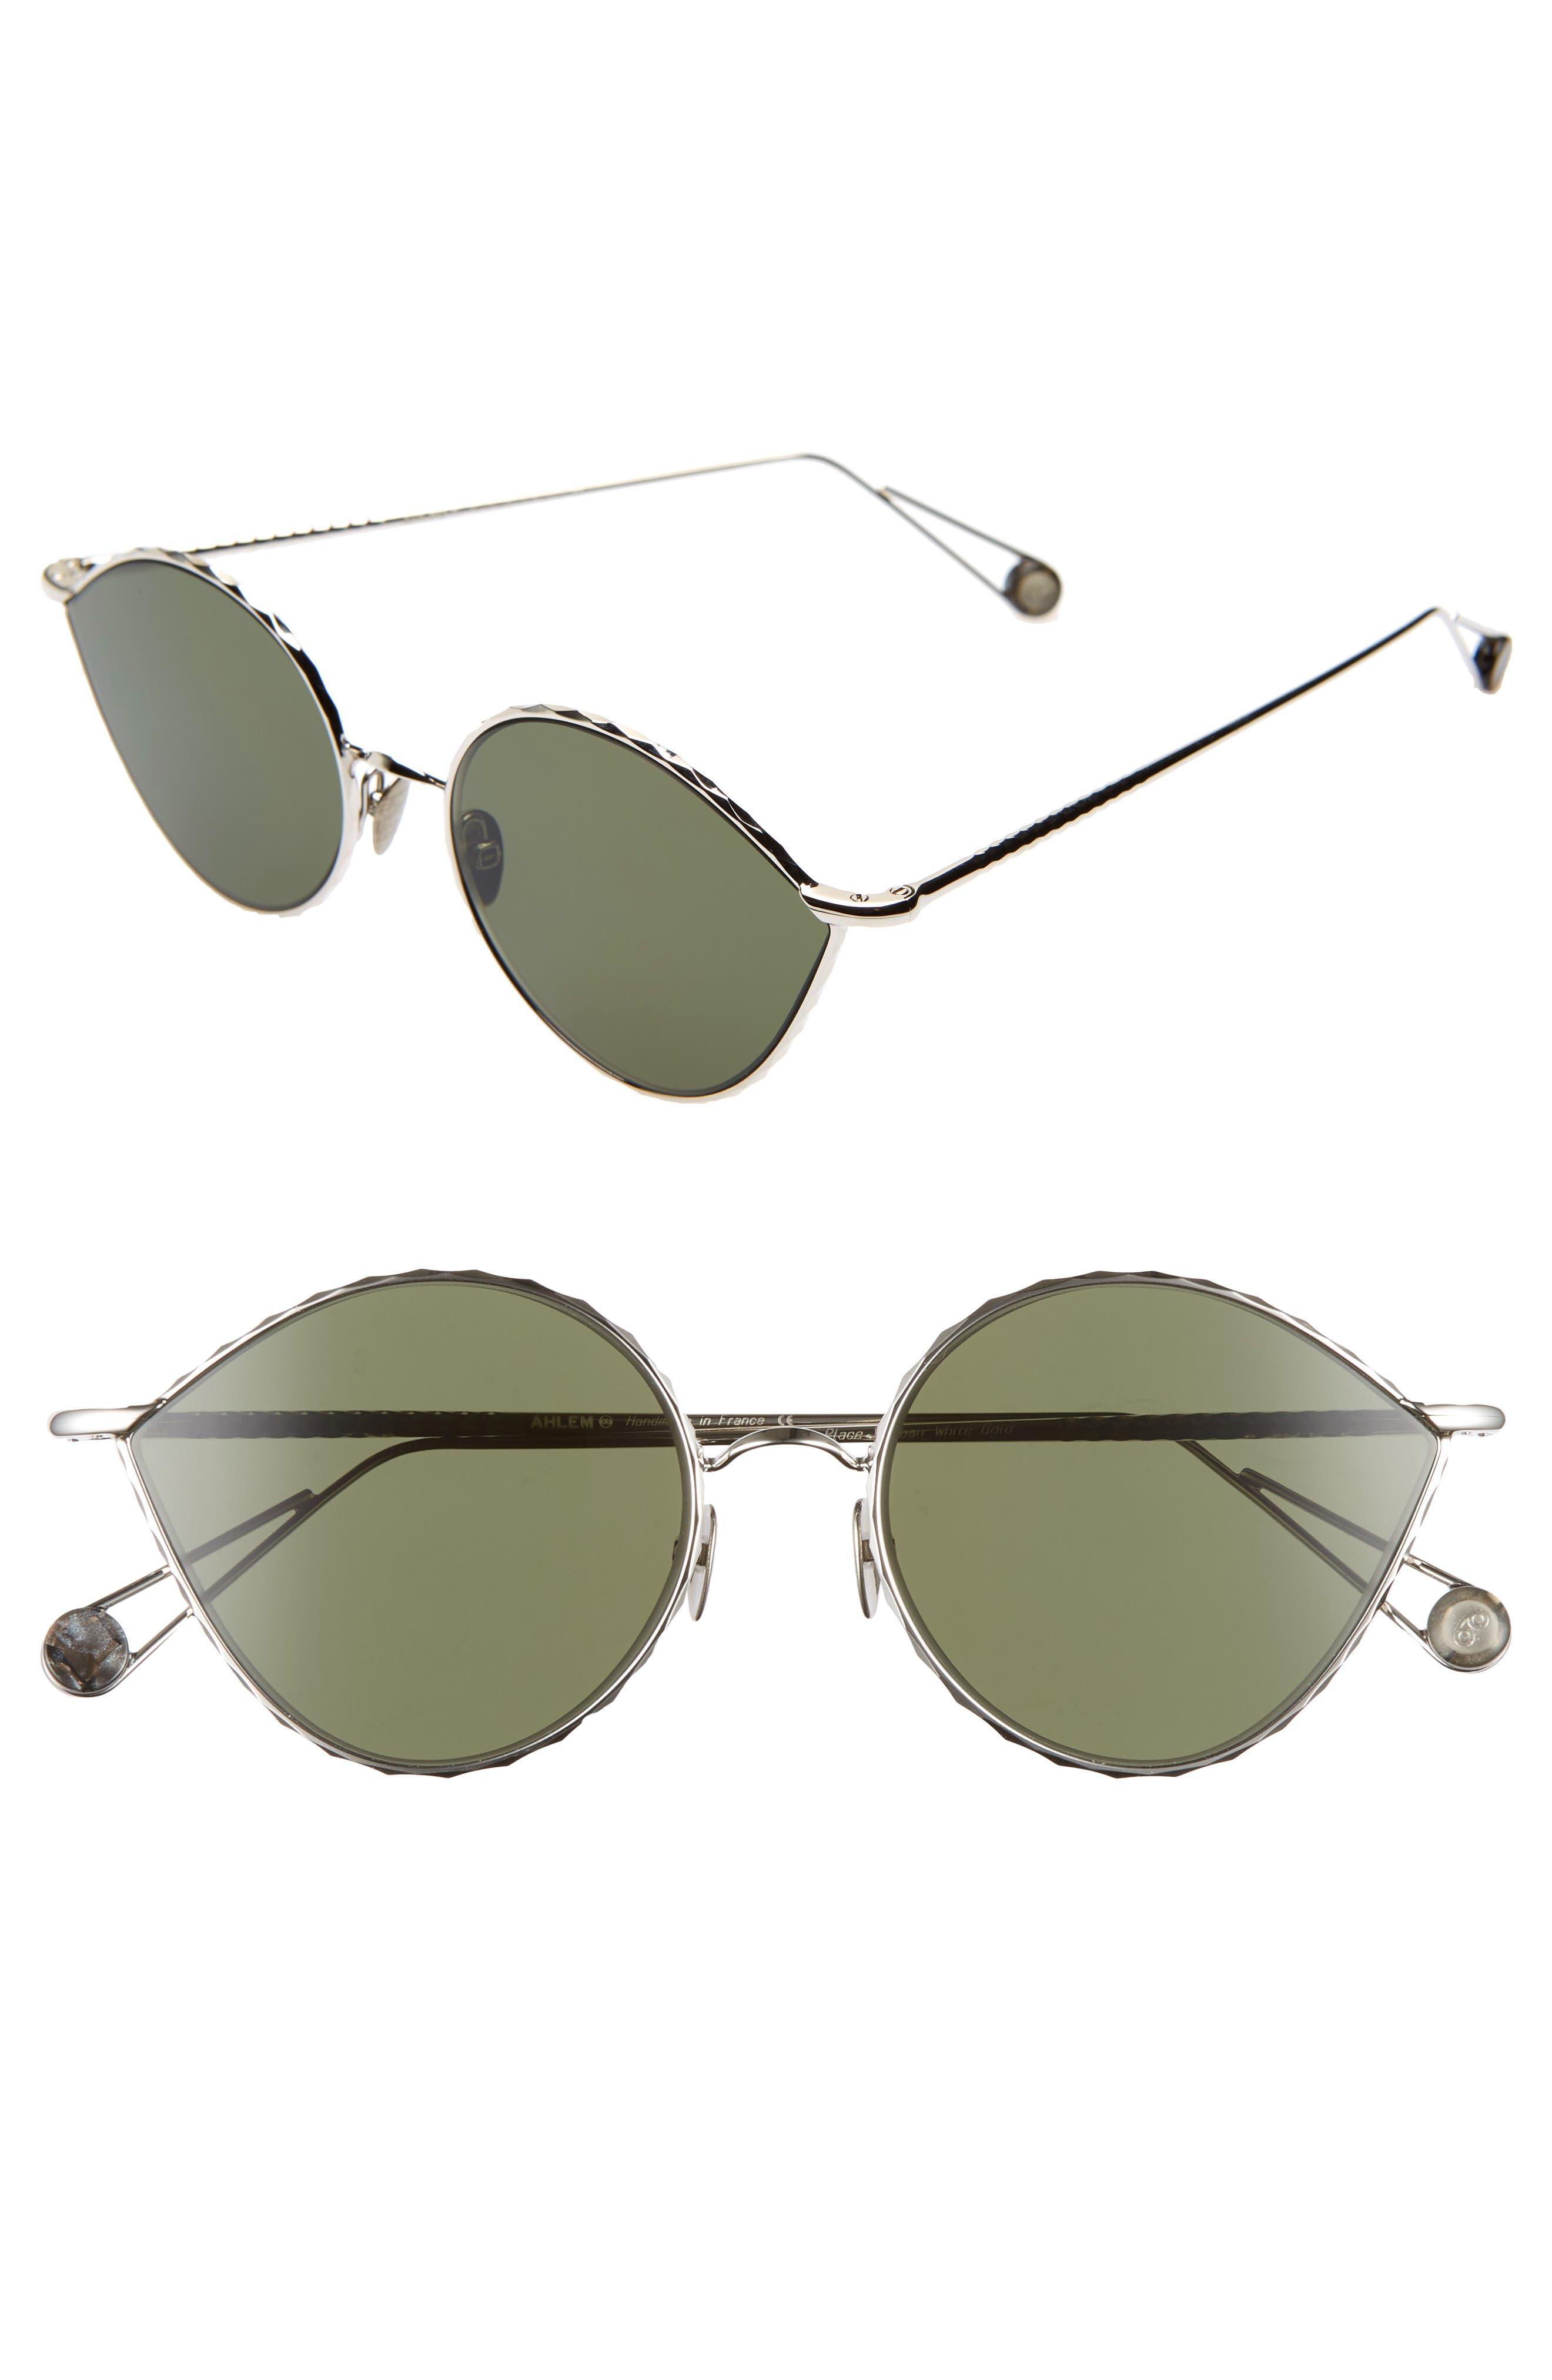 AHLEM Place Vauban 52Mm Cat Eye Sunglasses - White Gold